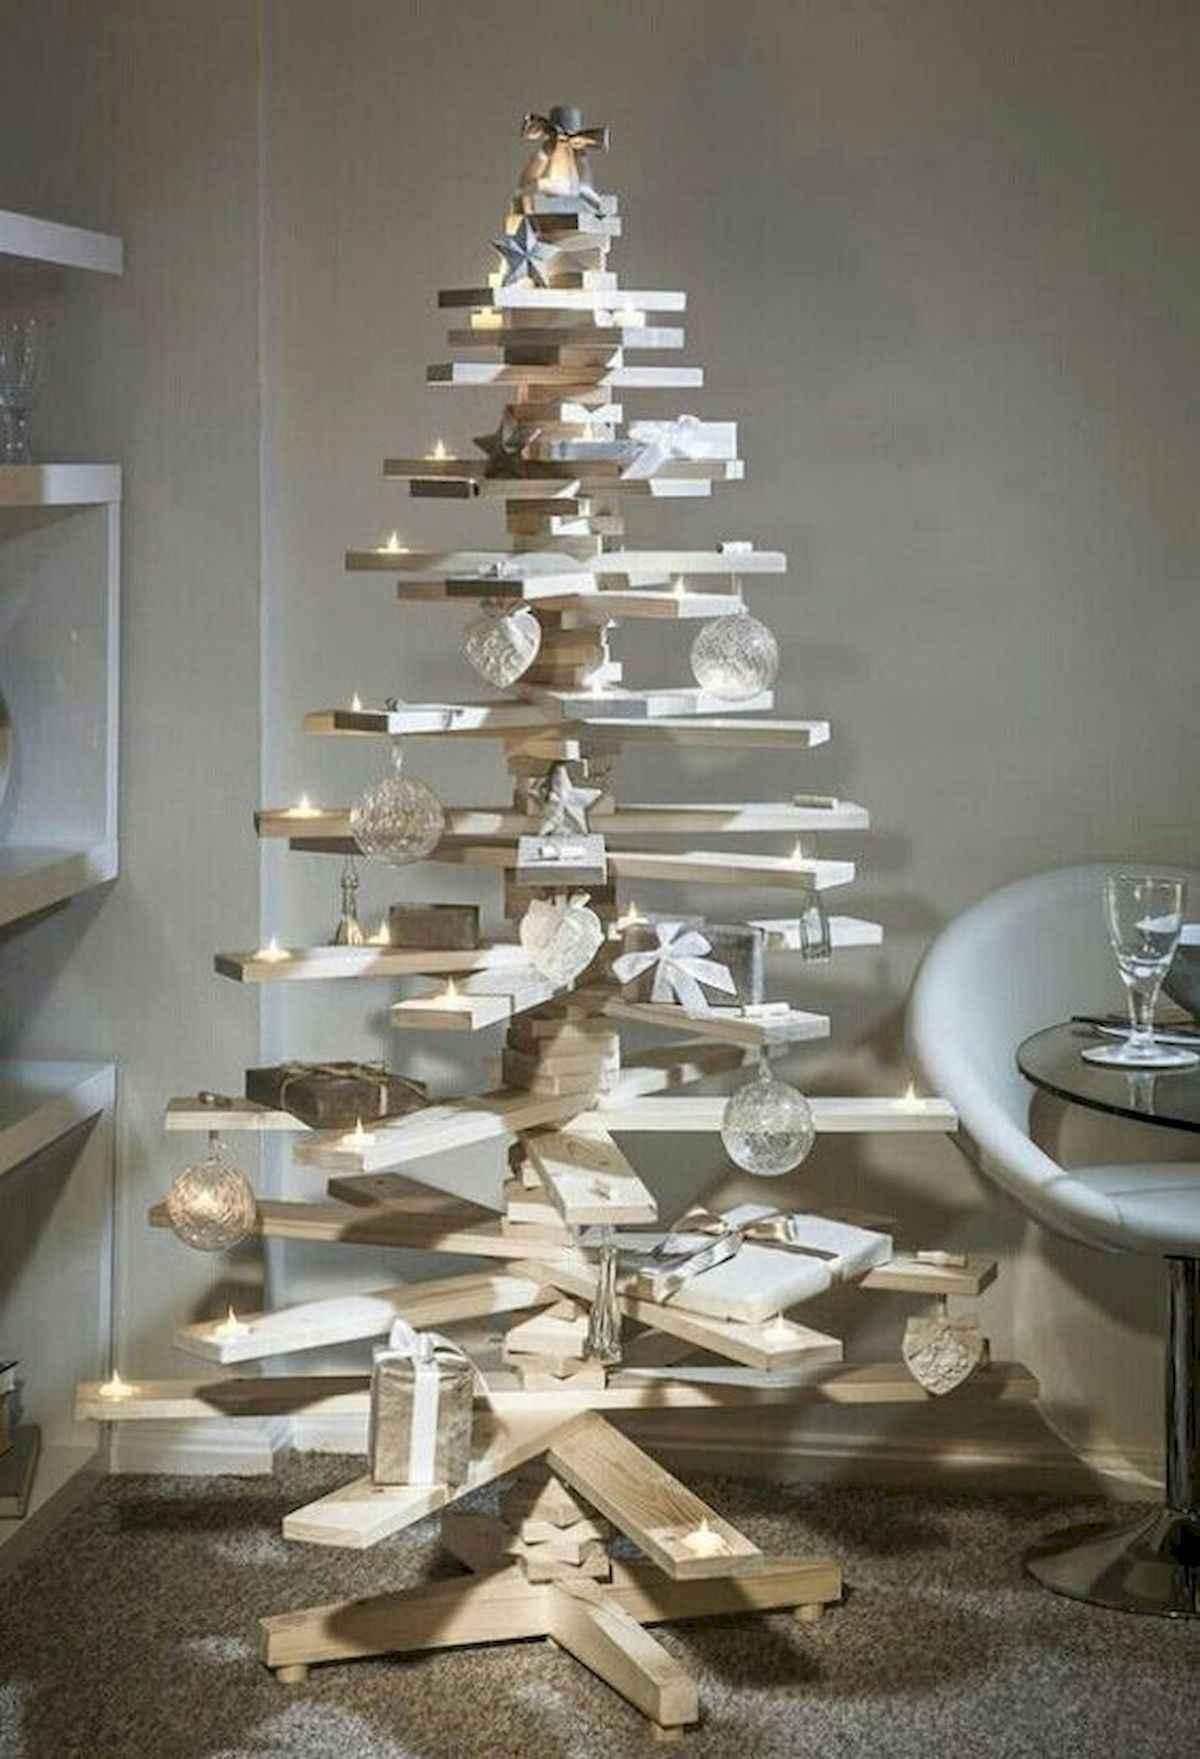 40 unique christmas tree ideas decorations (29)